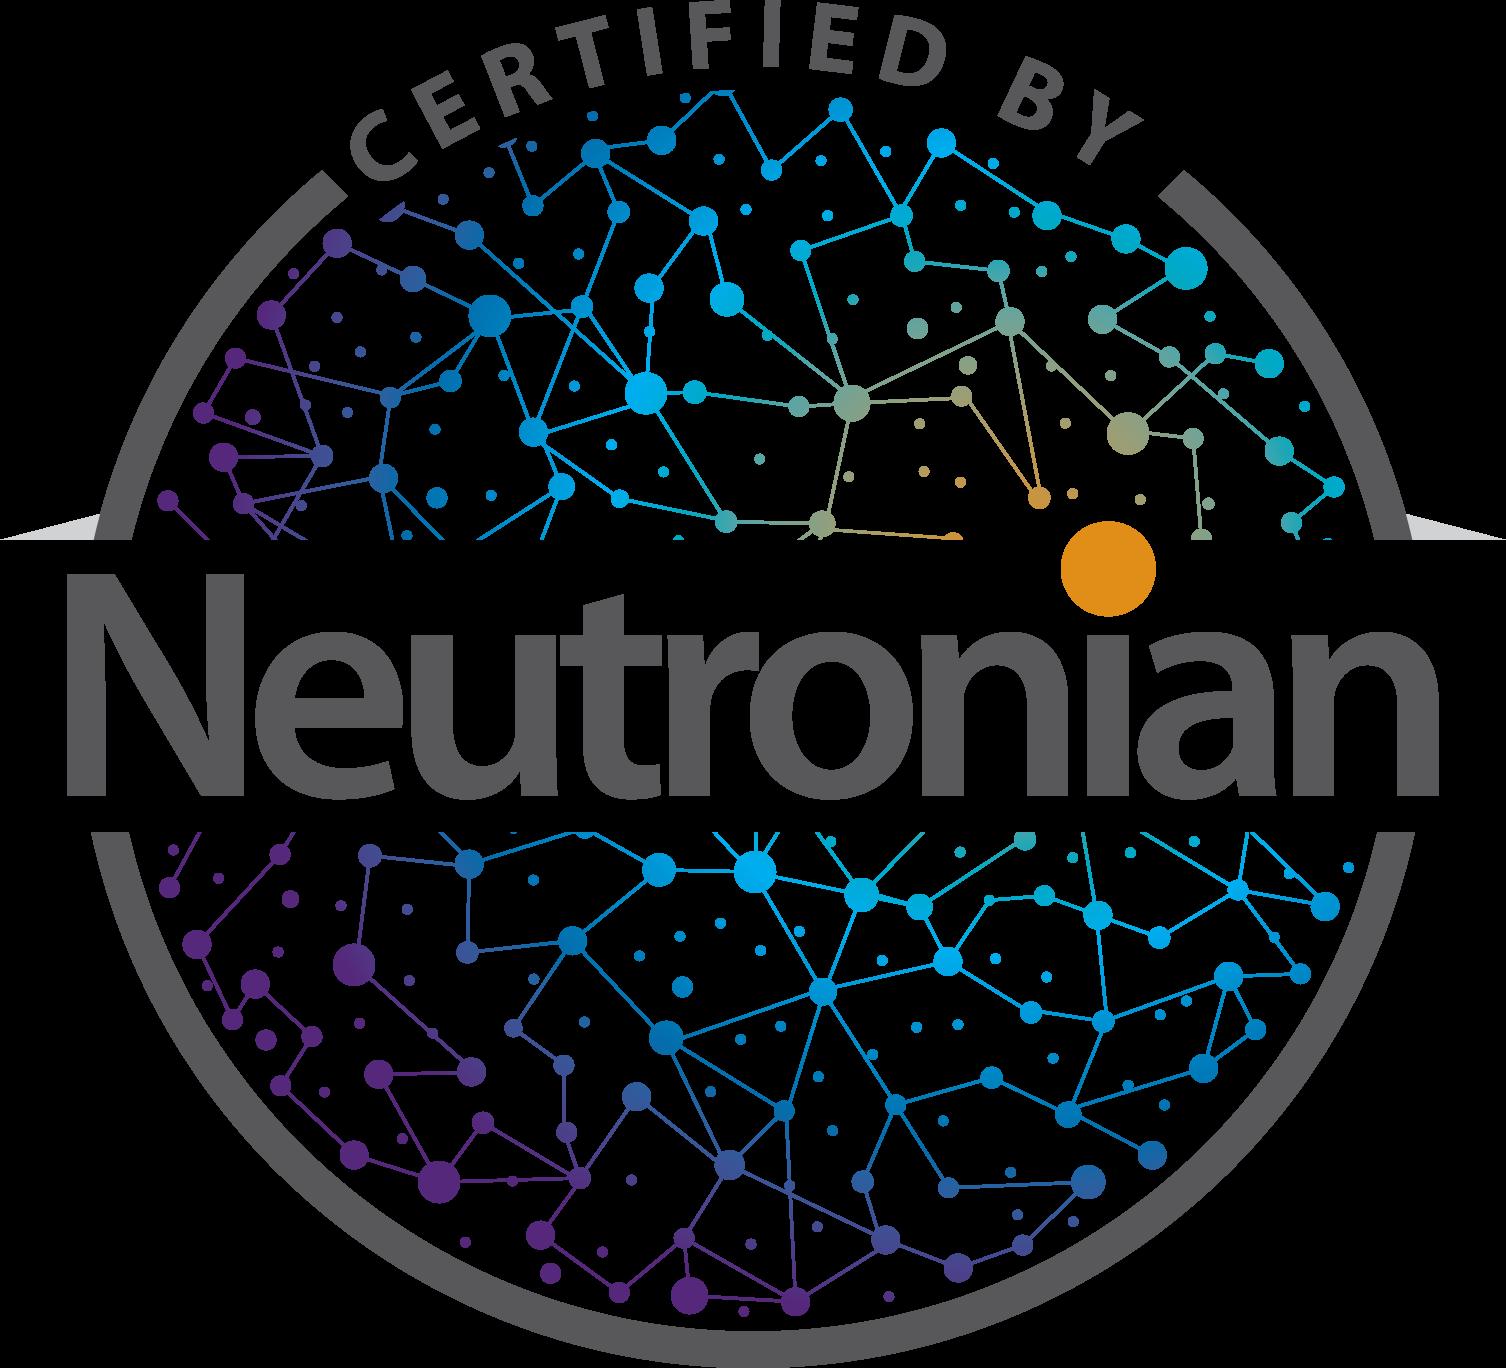 Neutronian